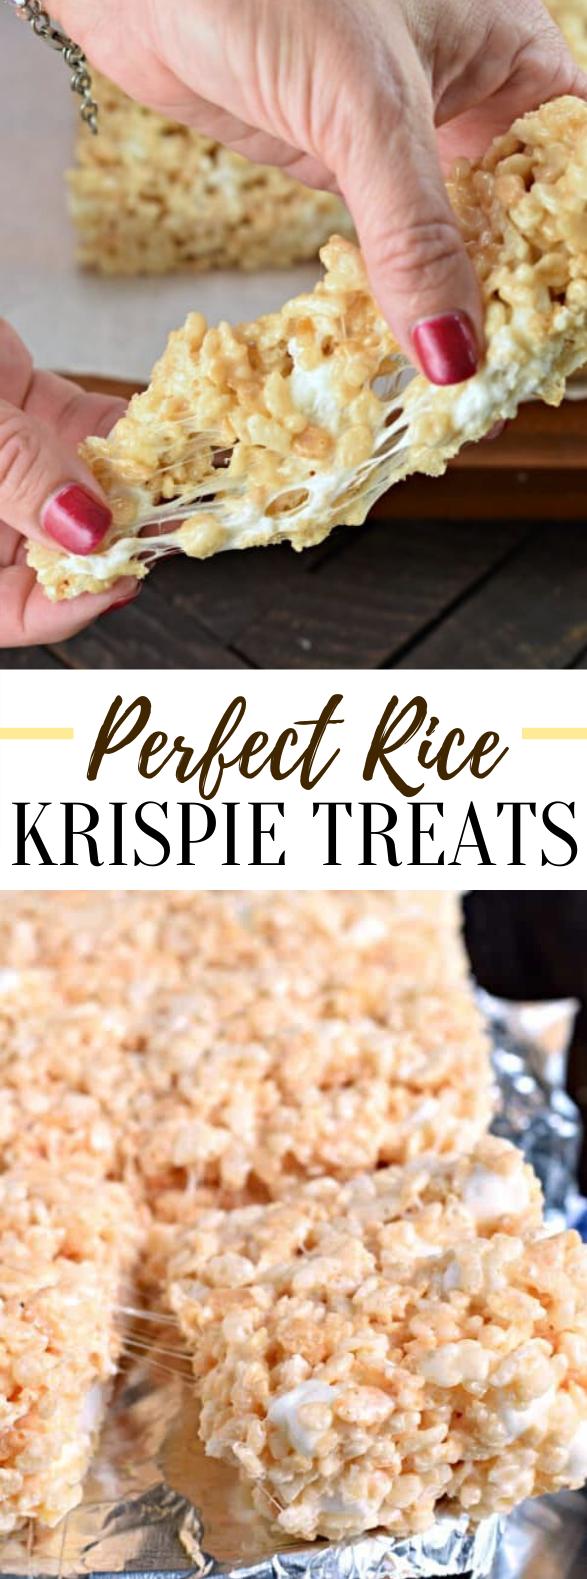 Perfect Rice Krispie Treats Recipe #desserts #kidfriendly